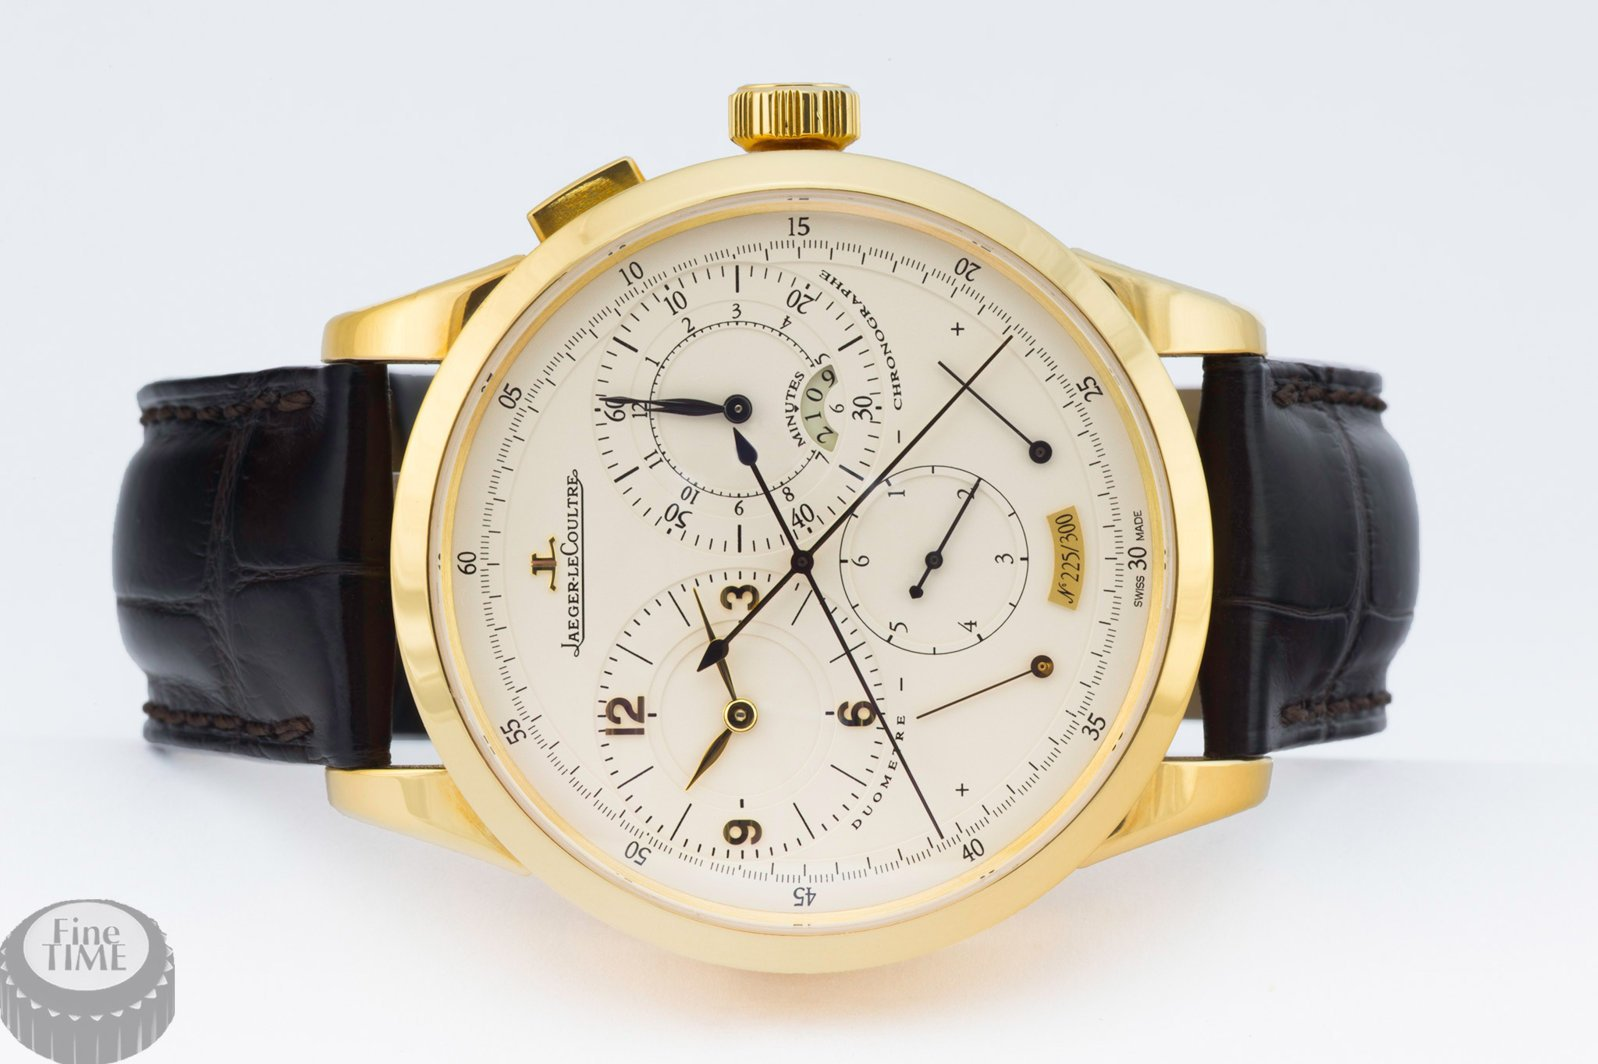 jaeger-lecoultre-duometre-chronographe-q6011420-01.jpg